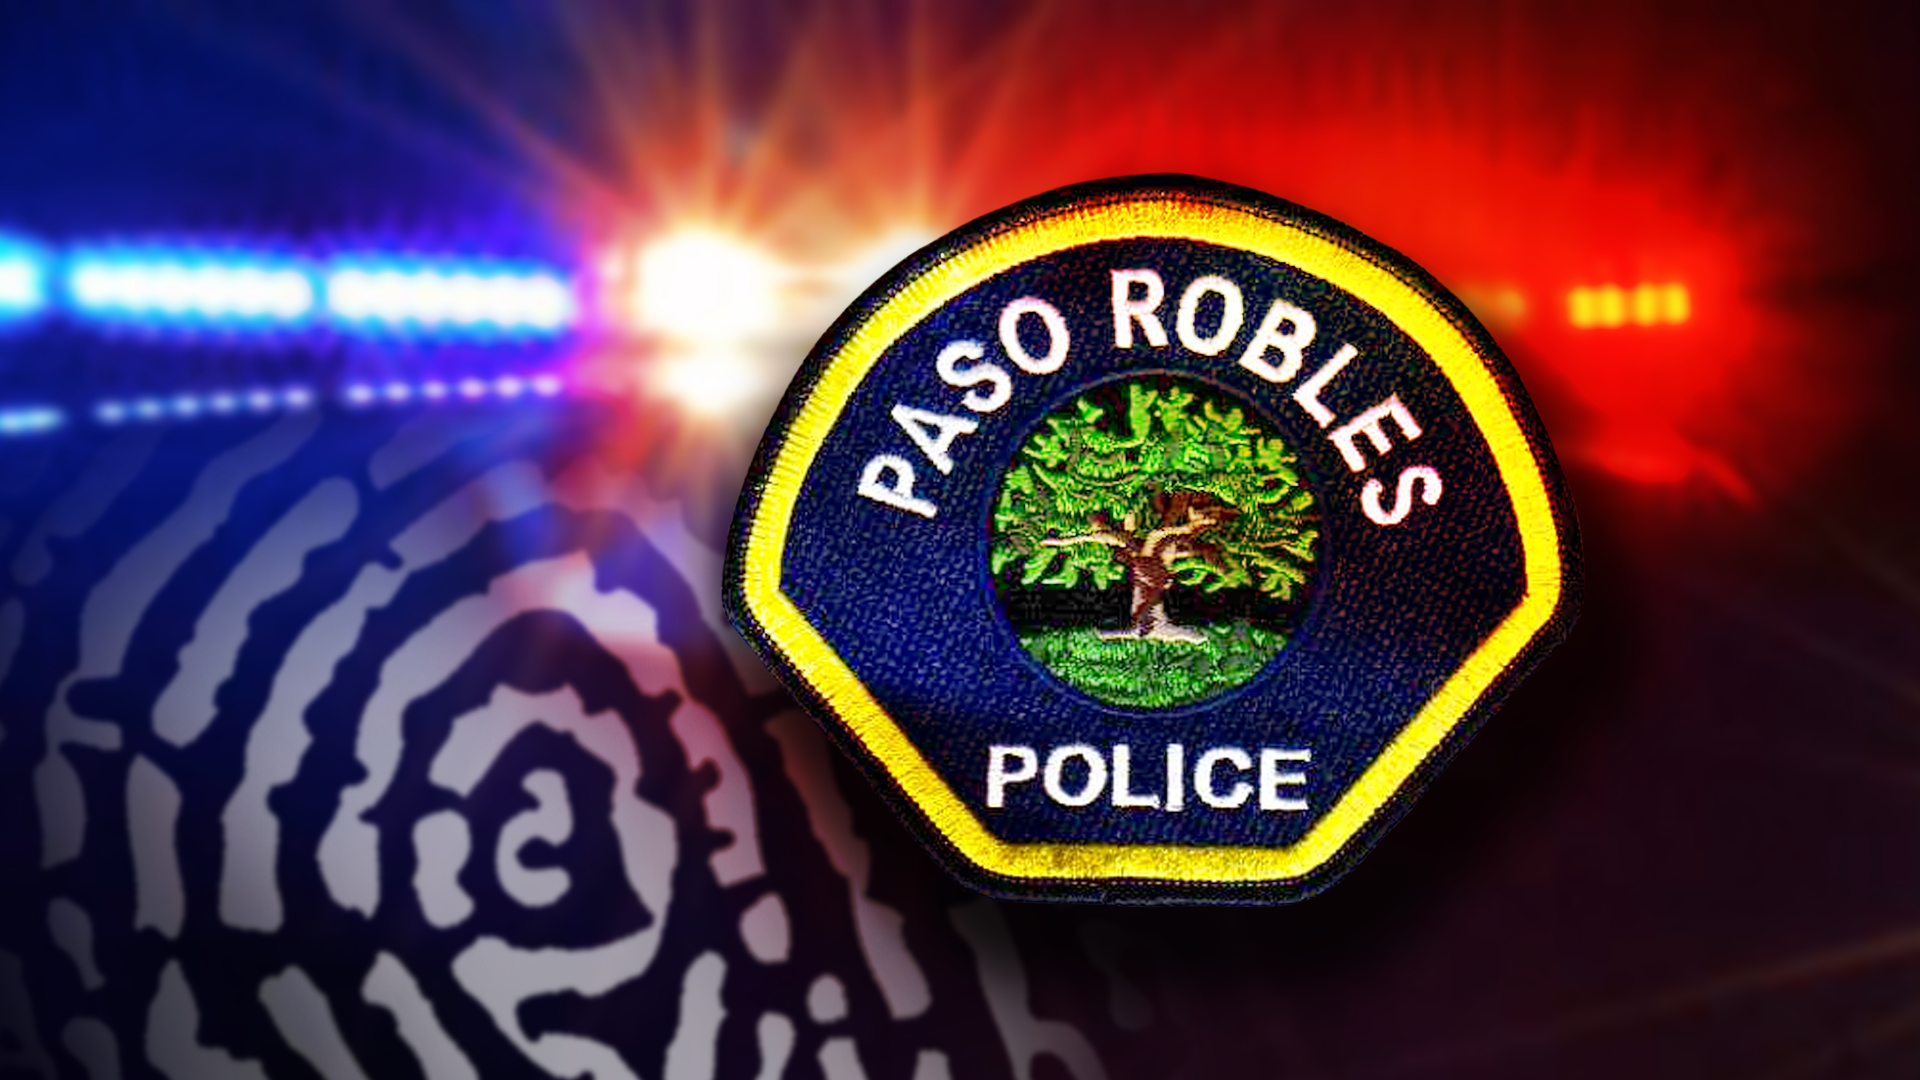 Paso Robles police arrest person on suspicion of arson after Smart & Final fire